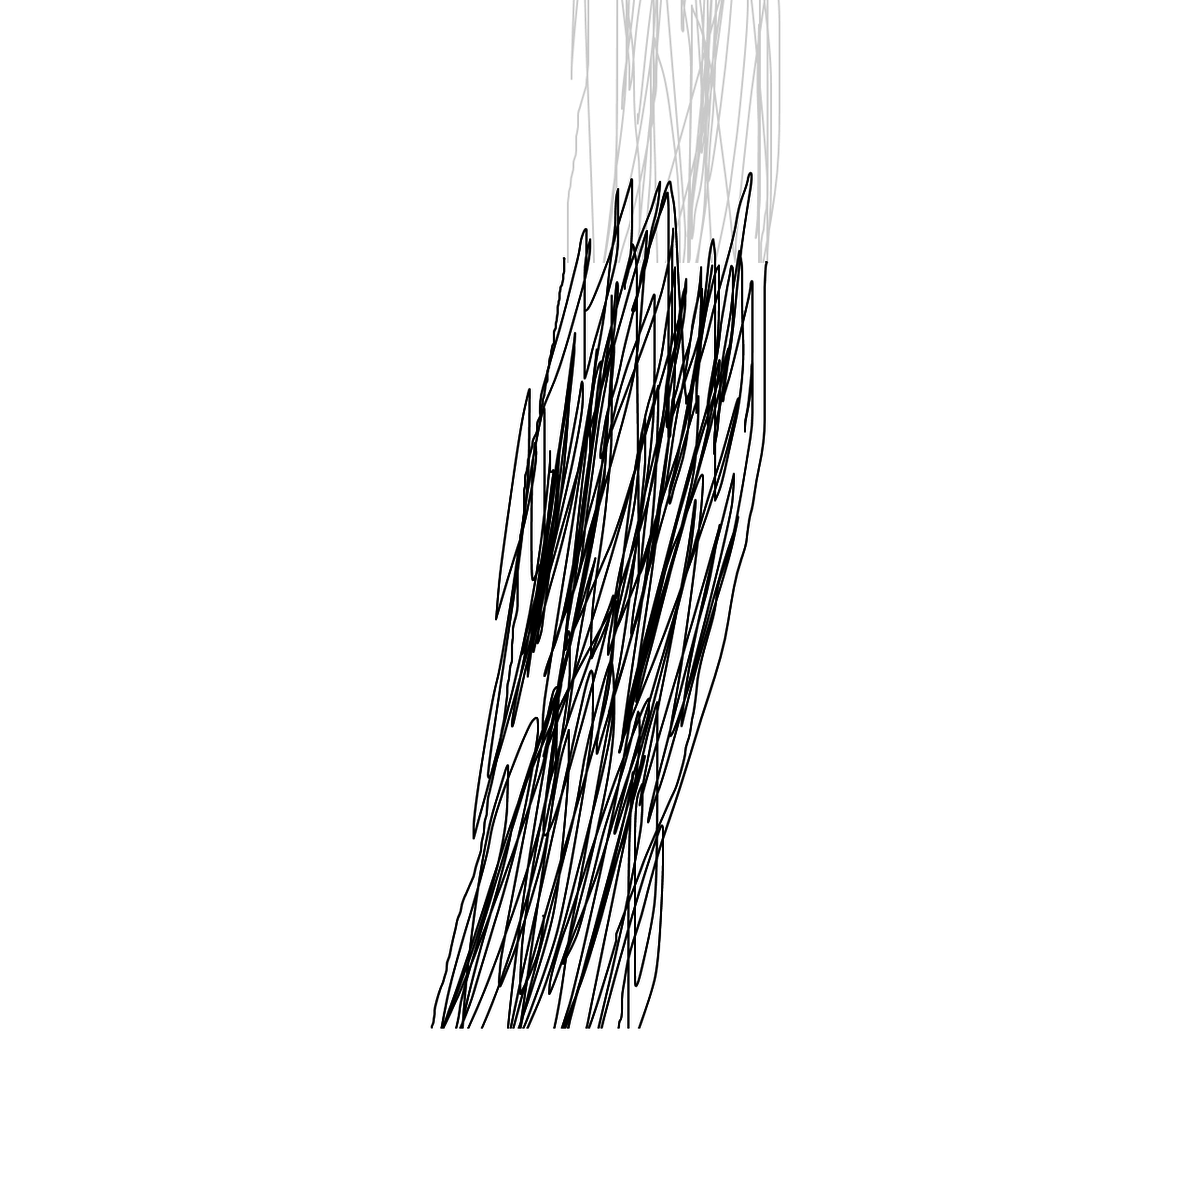 BAAAM drawing#11411 lat:52.4758987426757800lng: 13.4058046340942380